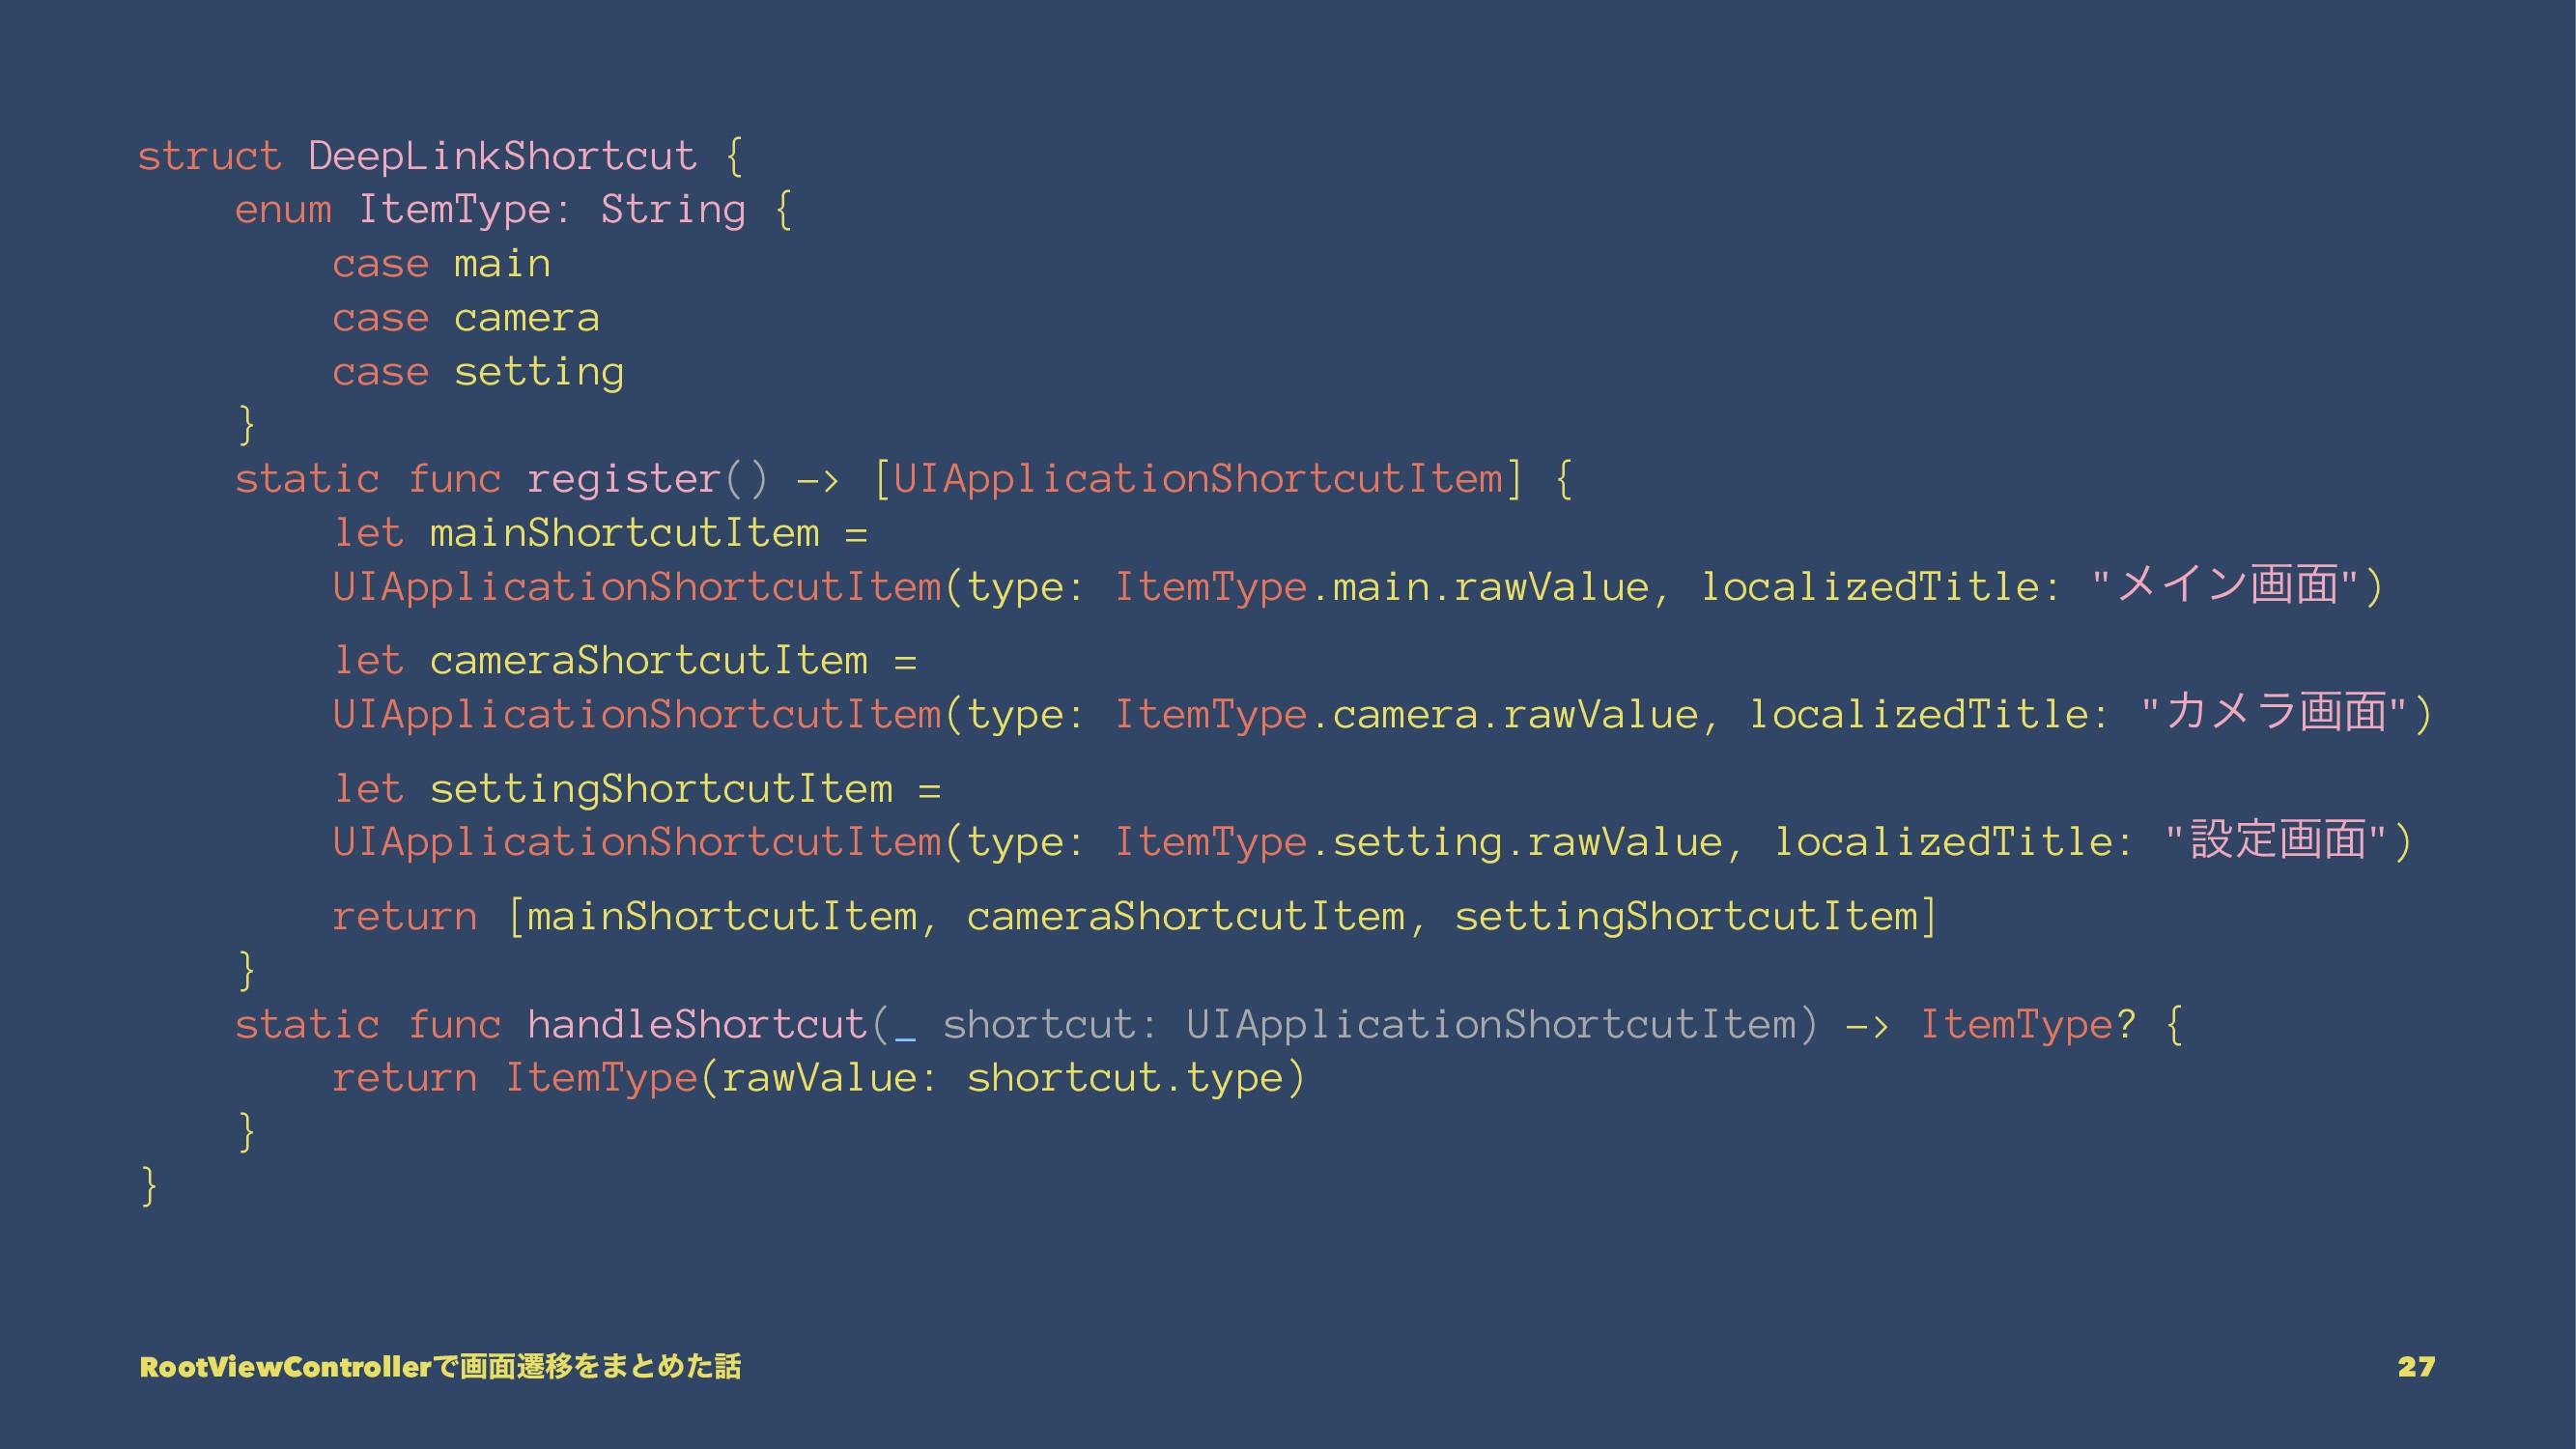 struct DeepLinkShortcut { enum ItemType: String...